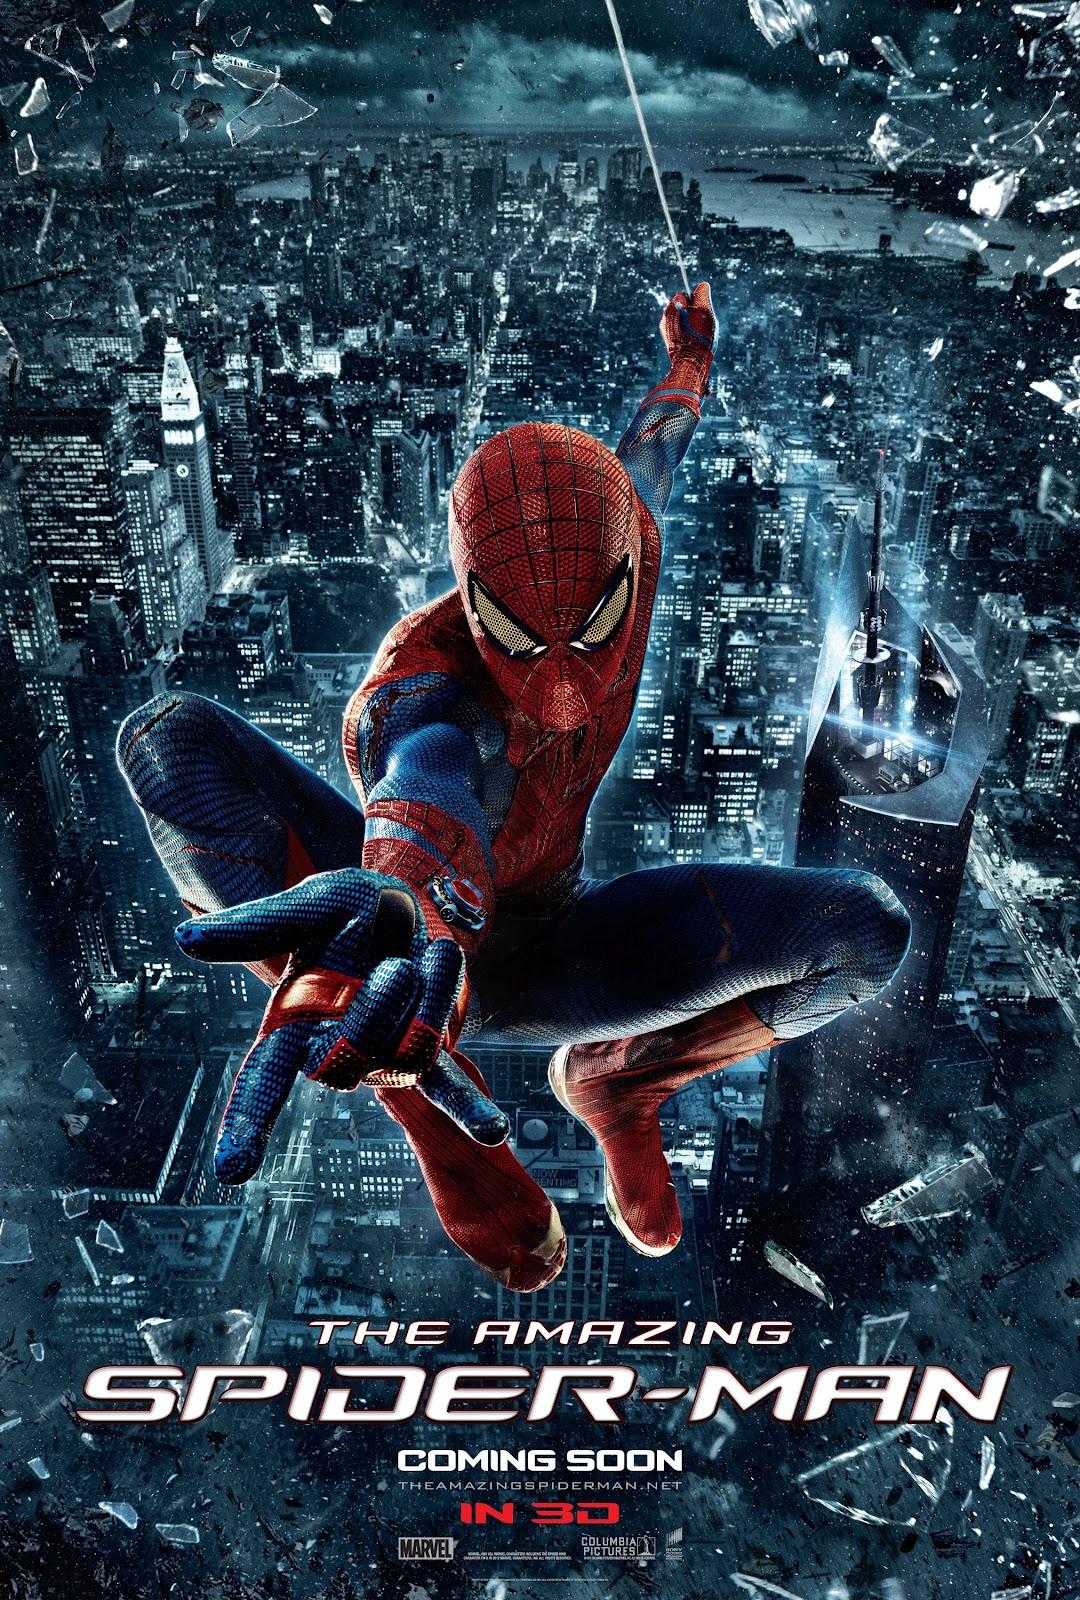 http://2.bp.blogspot.com/-4aTrGm2Mvak/UEp3mGQghrI/AAAAAAAAAao/pNqgzKHqEKc/s1600/Amazing_Spider-Man_theatrical_poster_02.jpg